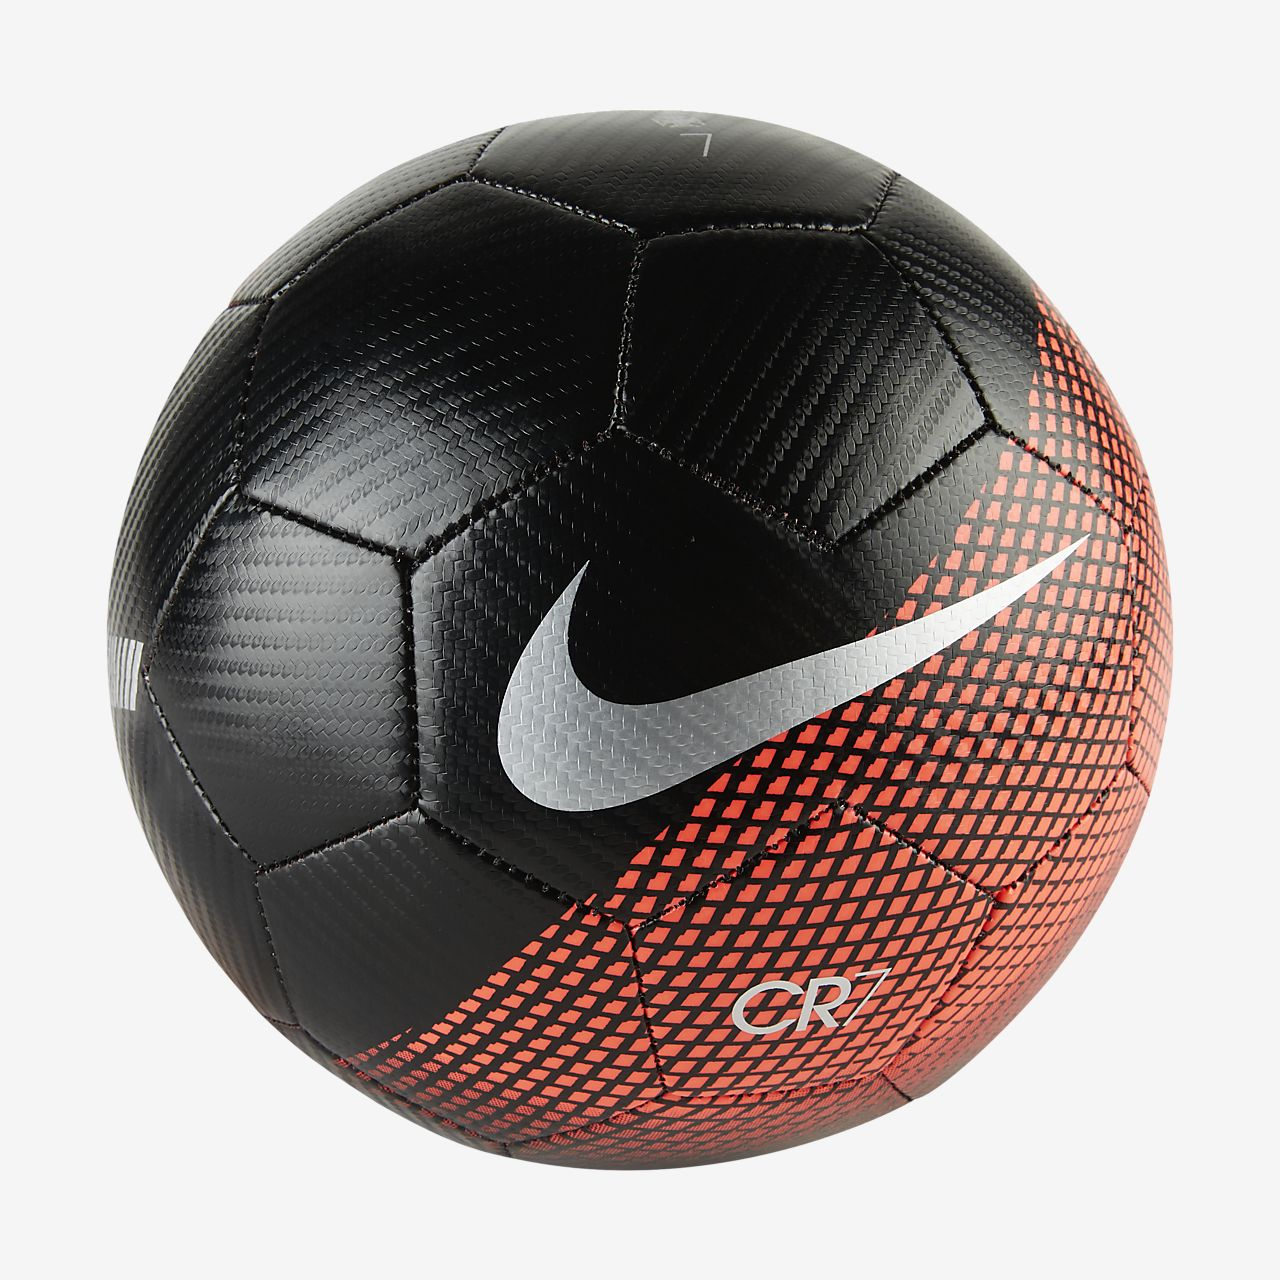 buy online 162a8 cc32d Ballon de football Nike CR7 Prestige